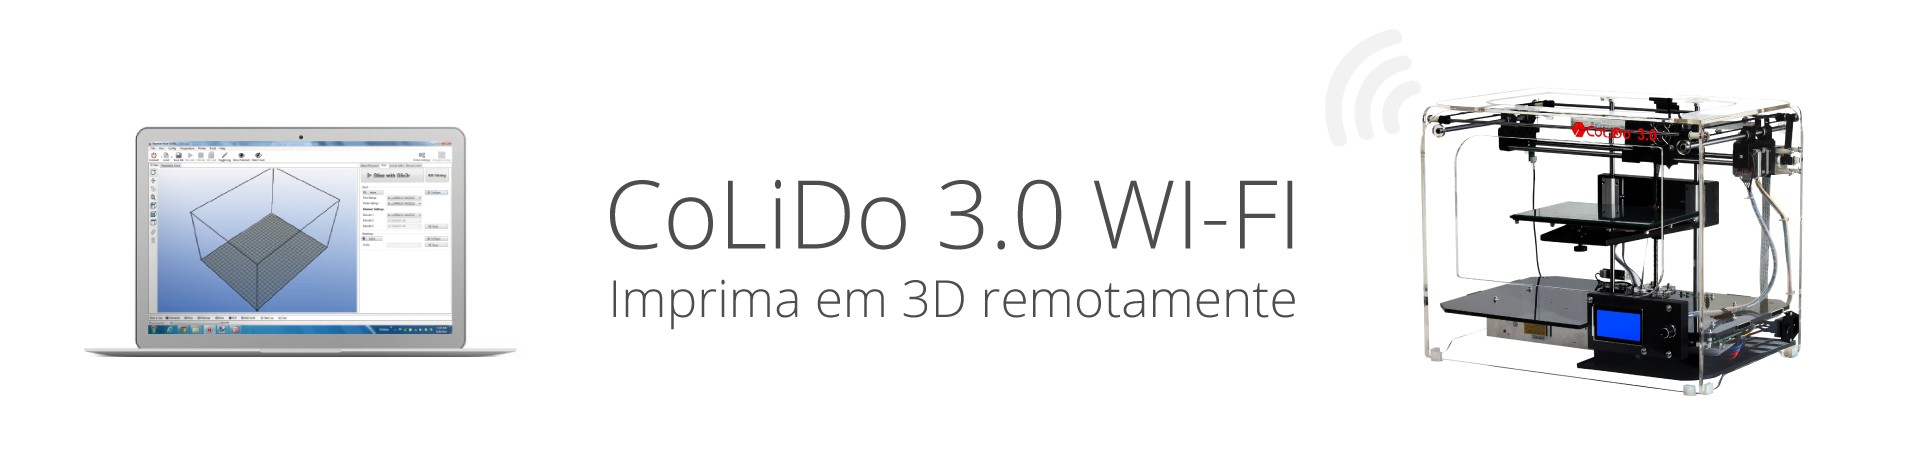 Impressora Colido 3.0 WiFi